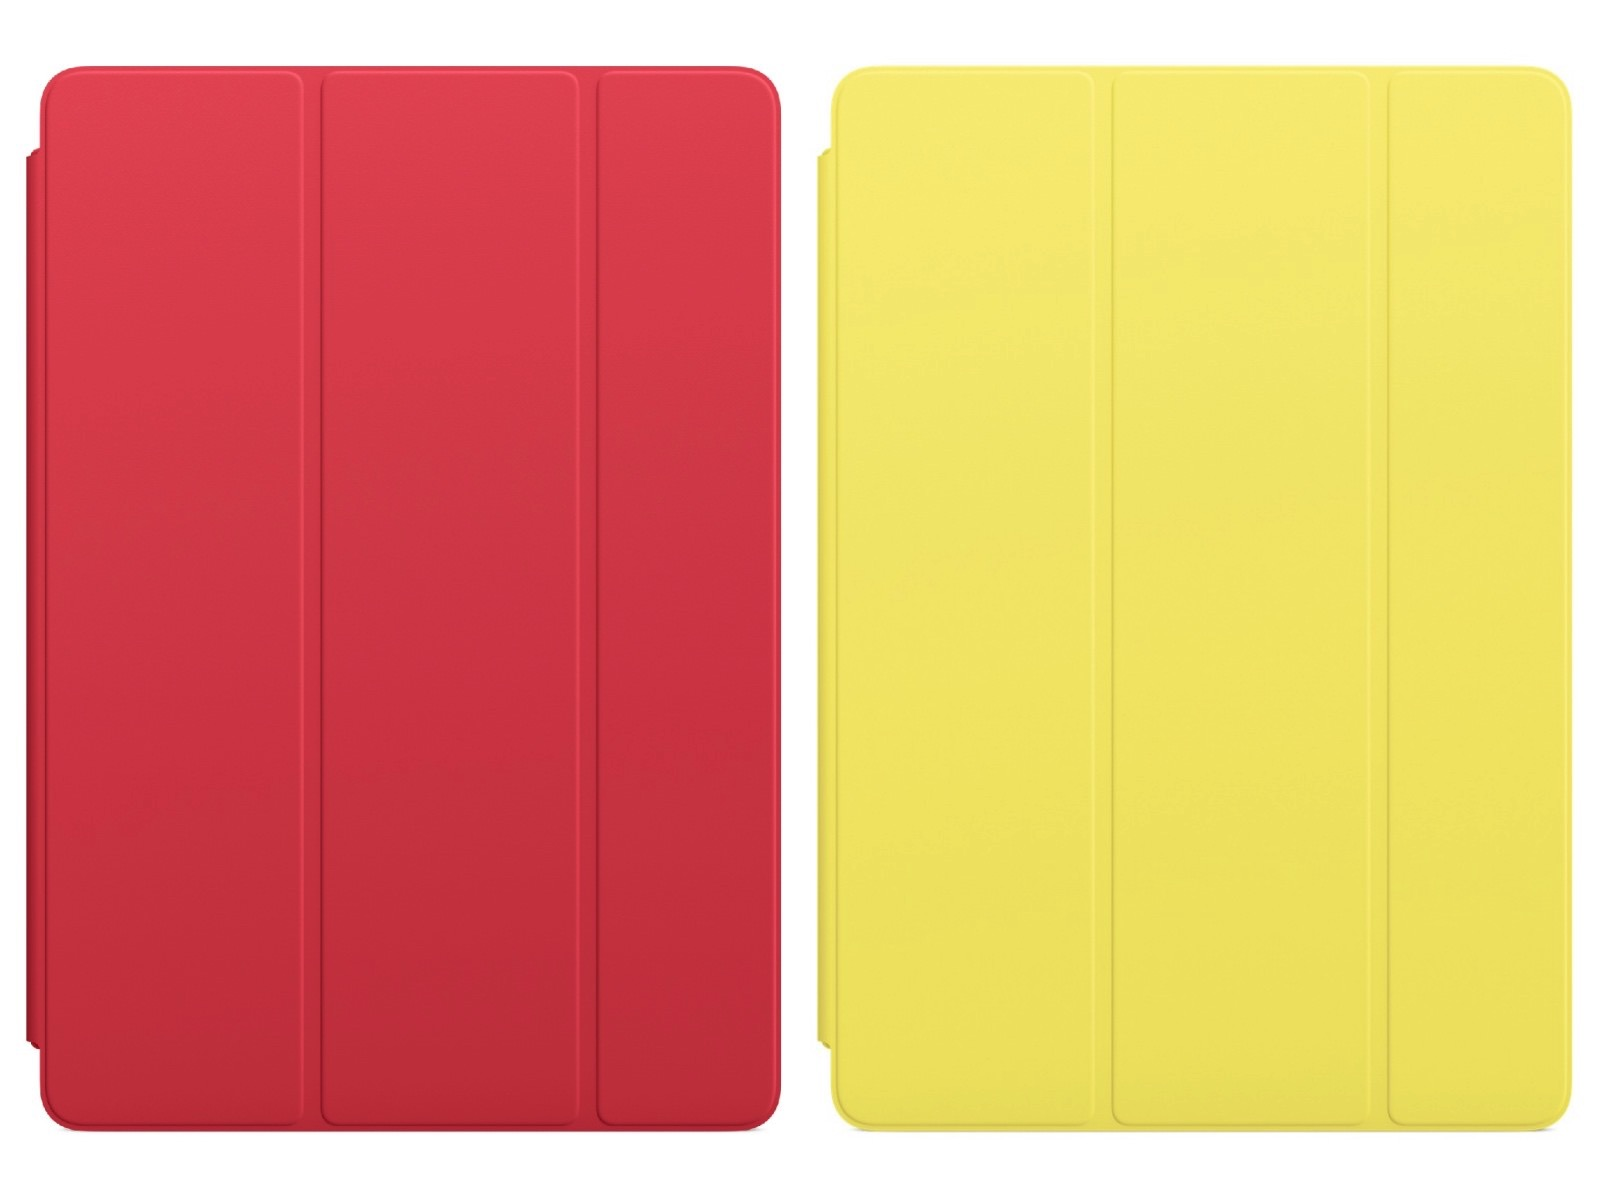 ipad-pro-smart-cover.jpg